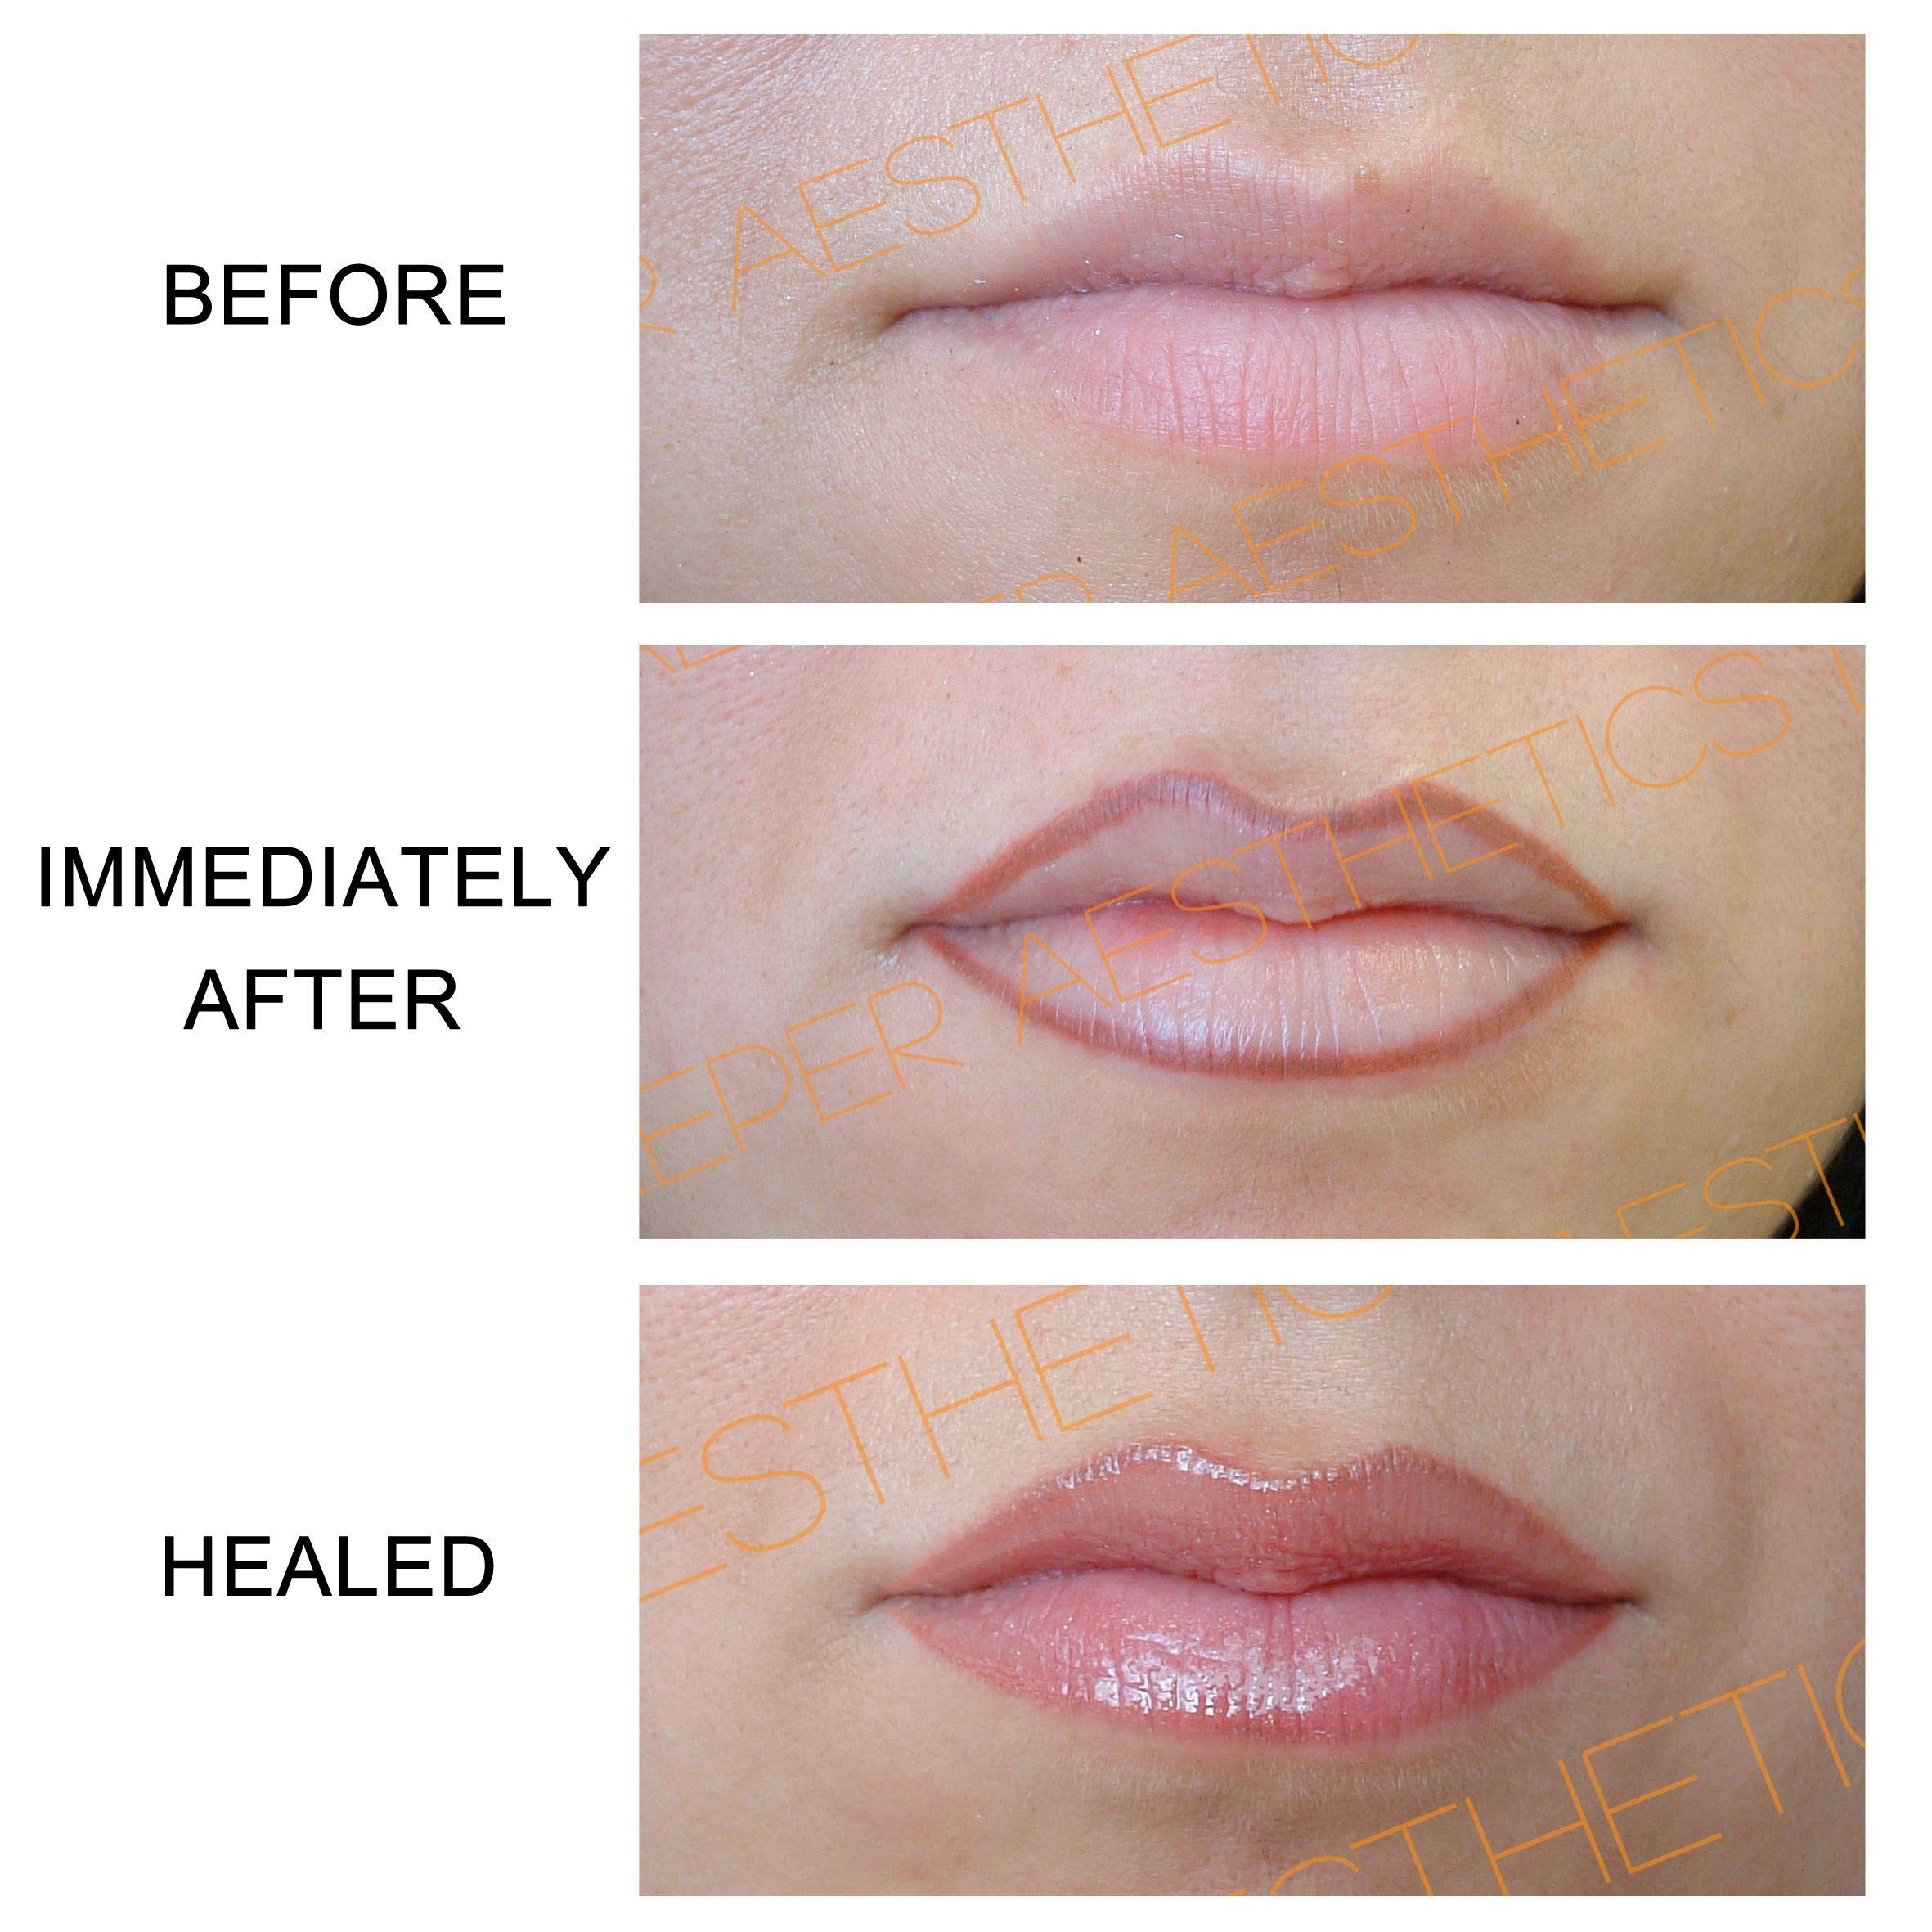 Semi Permanent Lip Liner Www Deeperaesthetics Co Uk Permanent Lipstick Lip Permanent Makeup Permanent Makeup